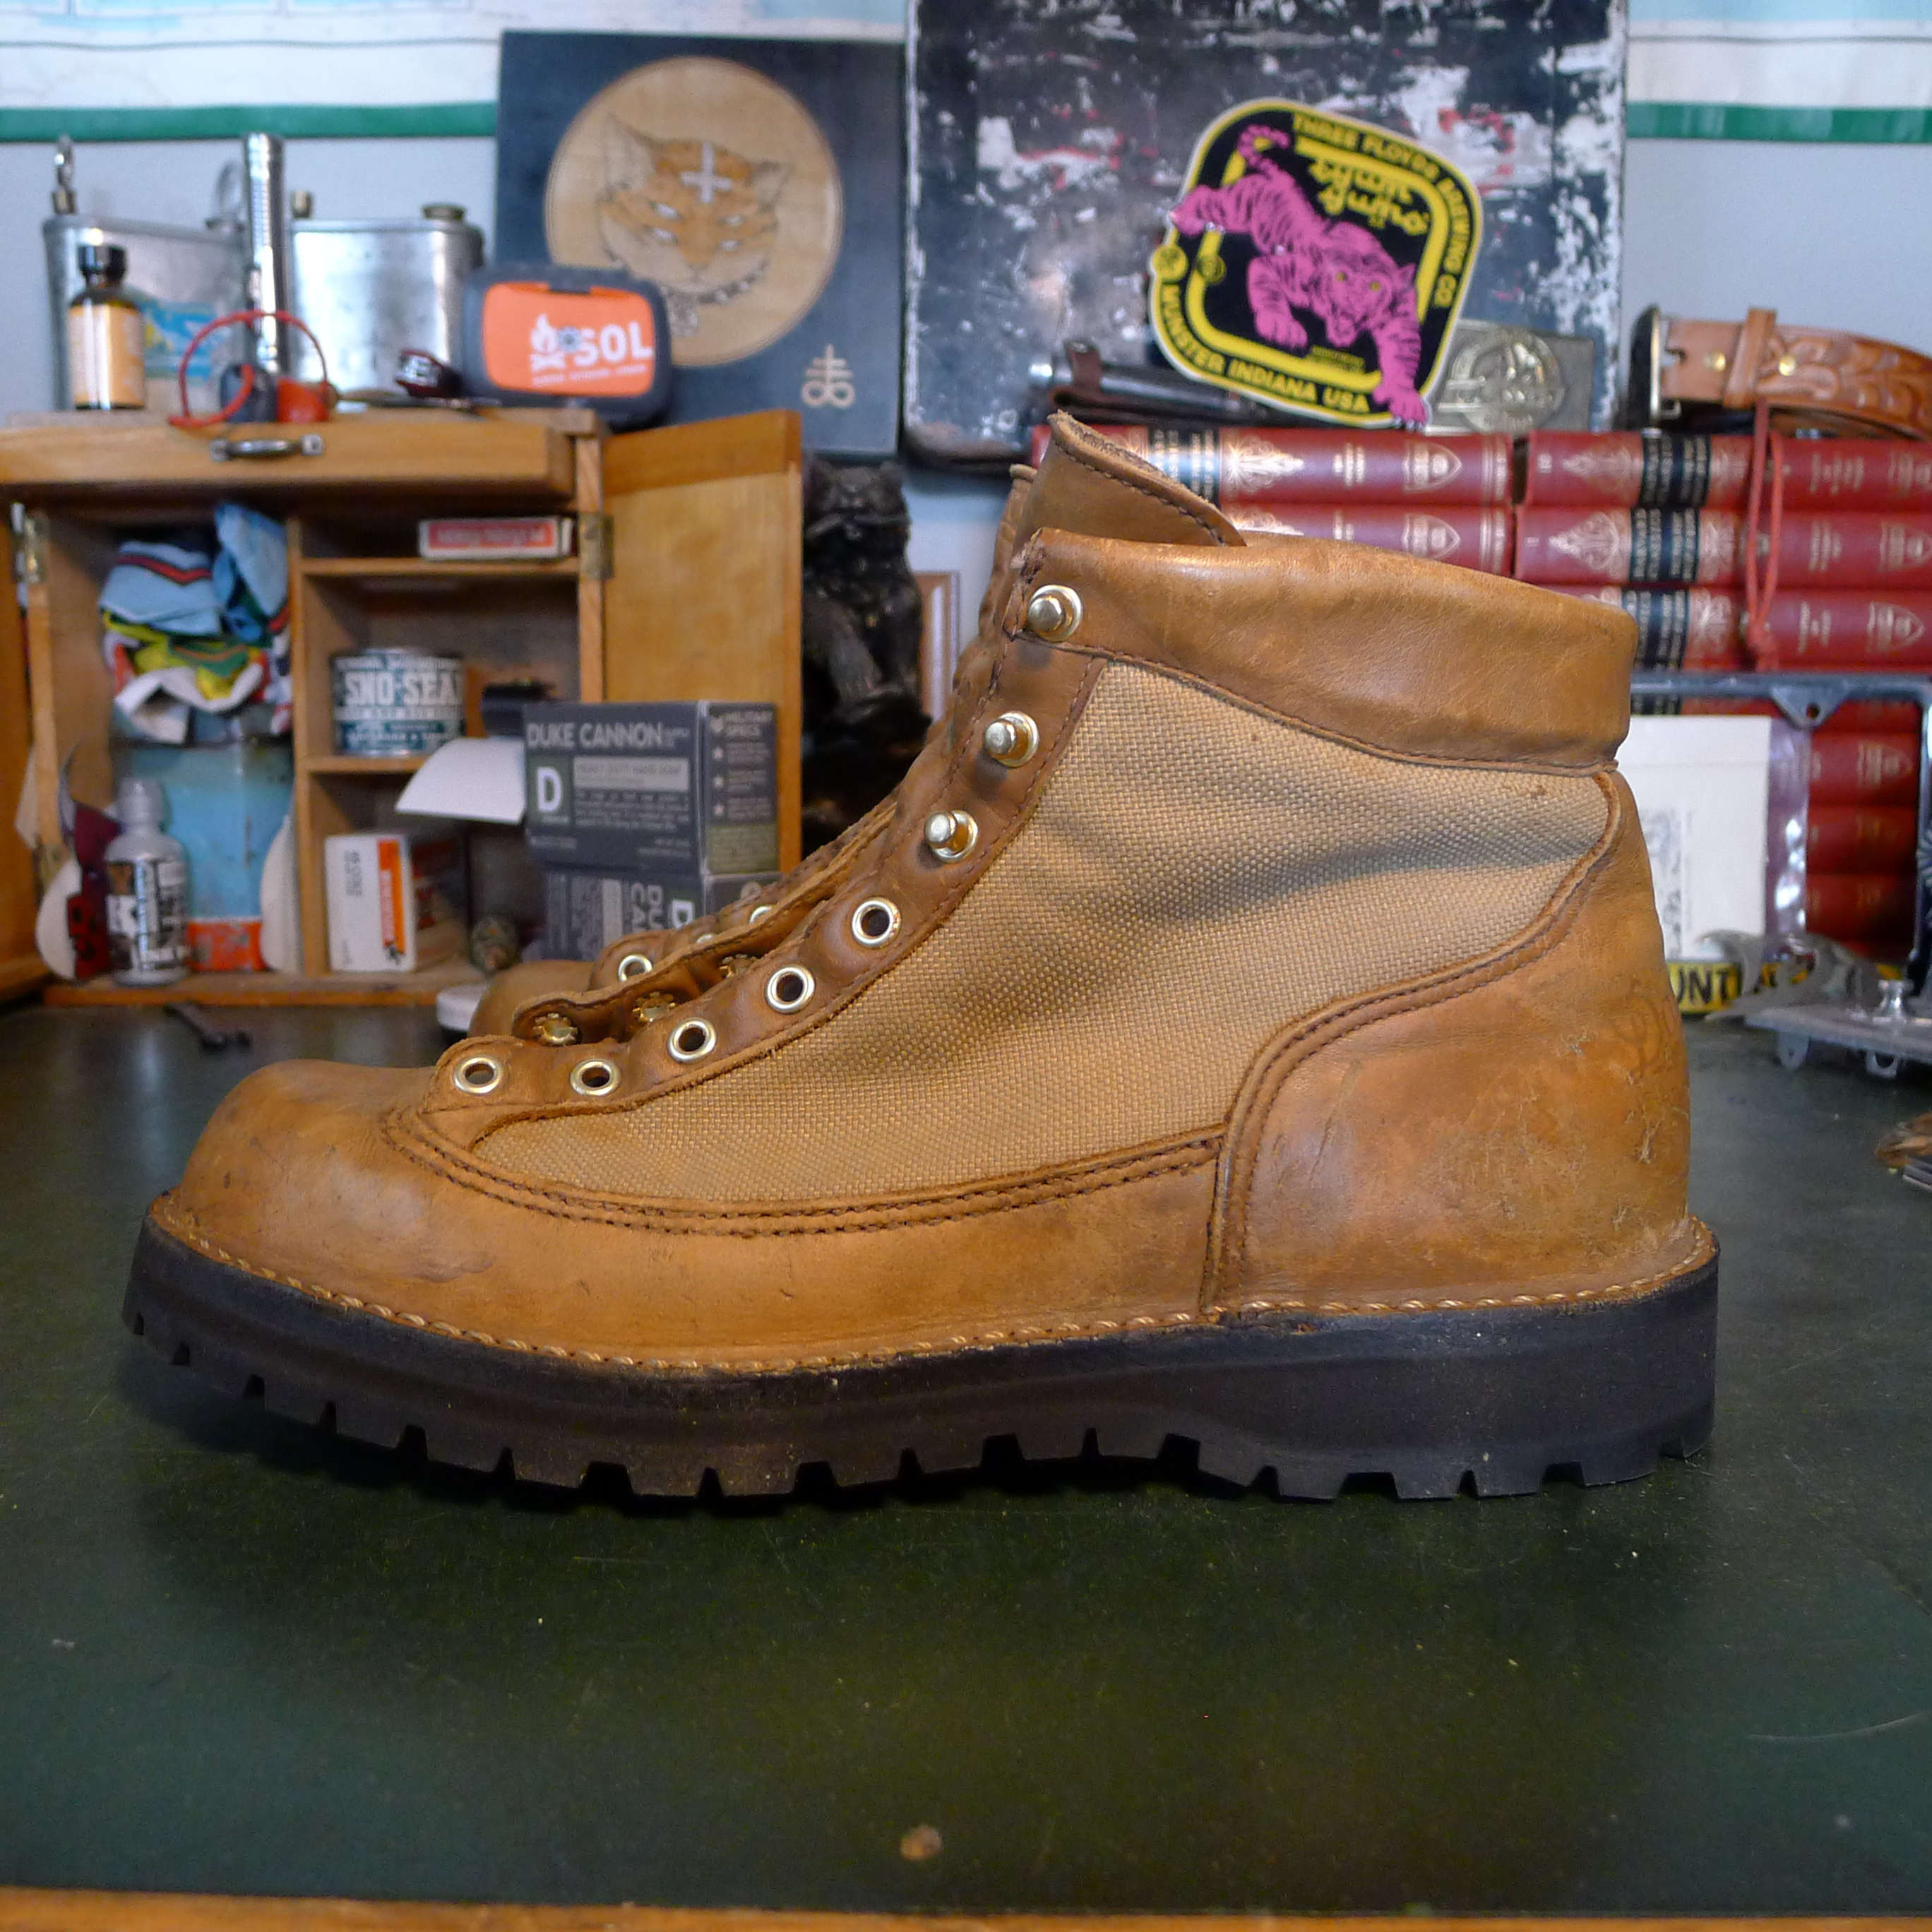 874aaf0db2f49 Danner Boot Recrafting – Basecamp Vintage   Archives